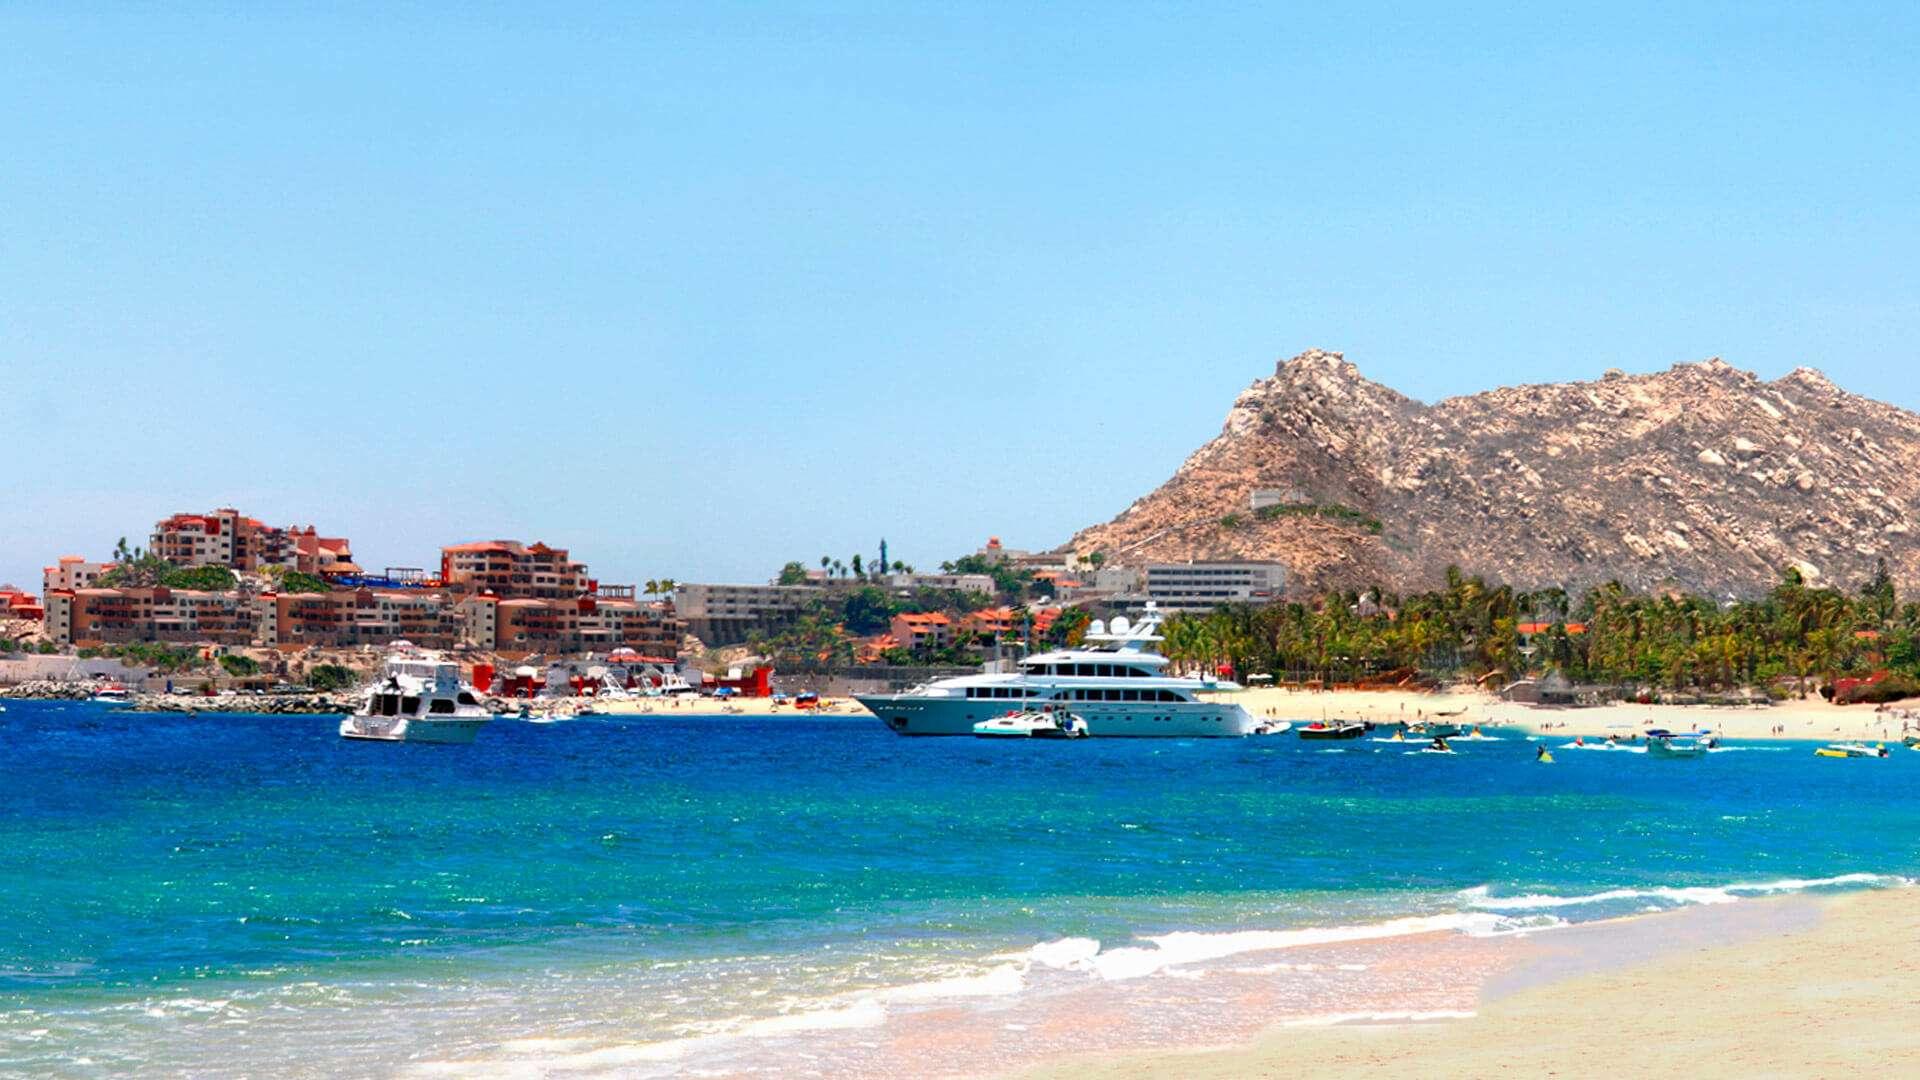 Clean Beaches In Cabo Playa El Medano